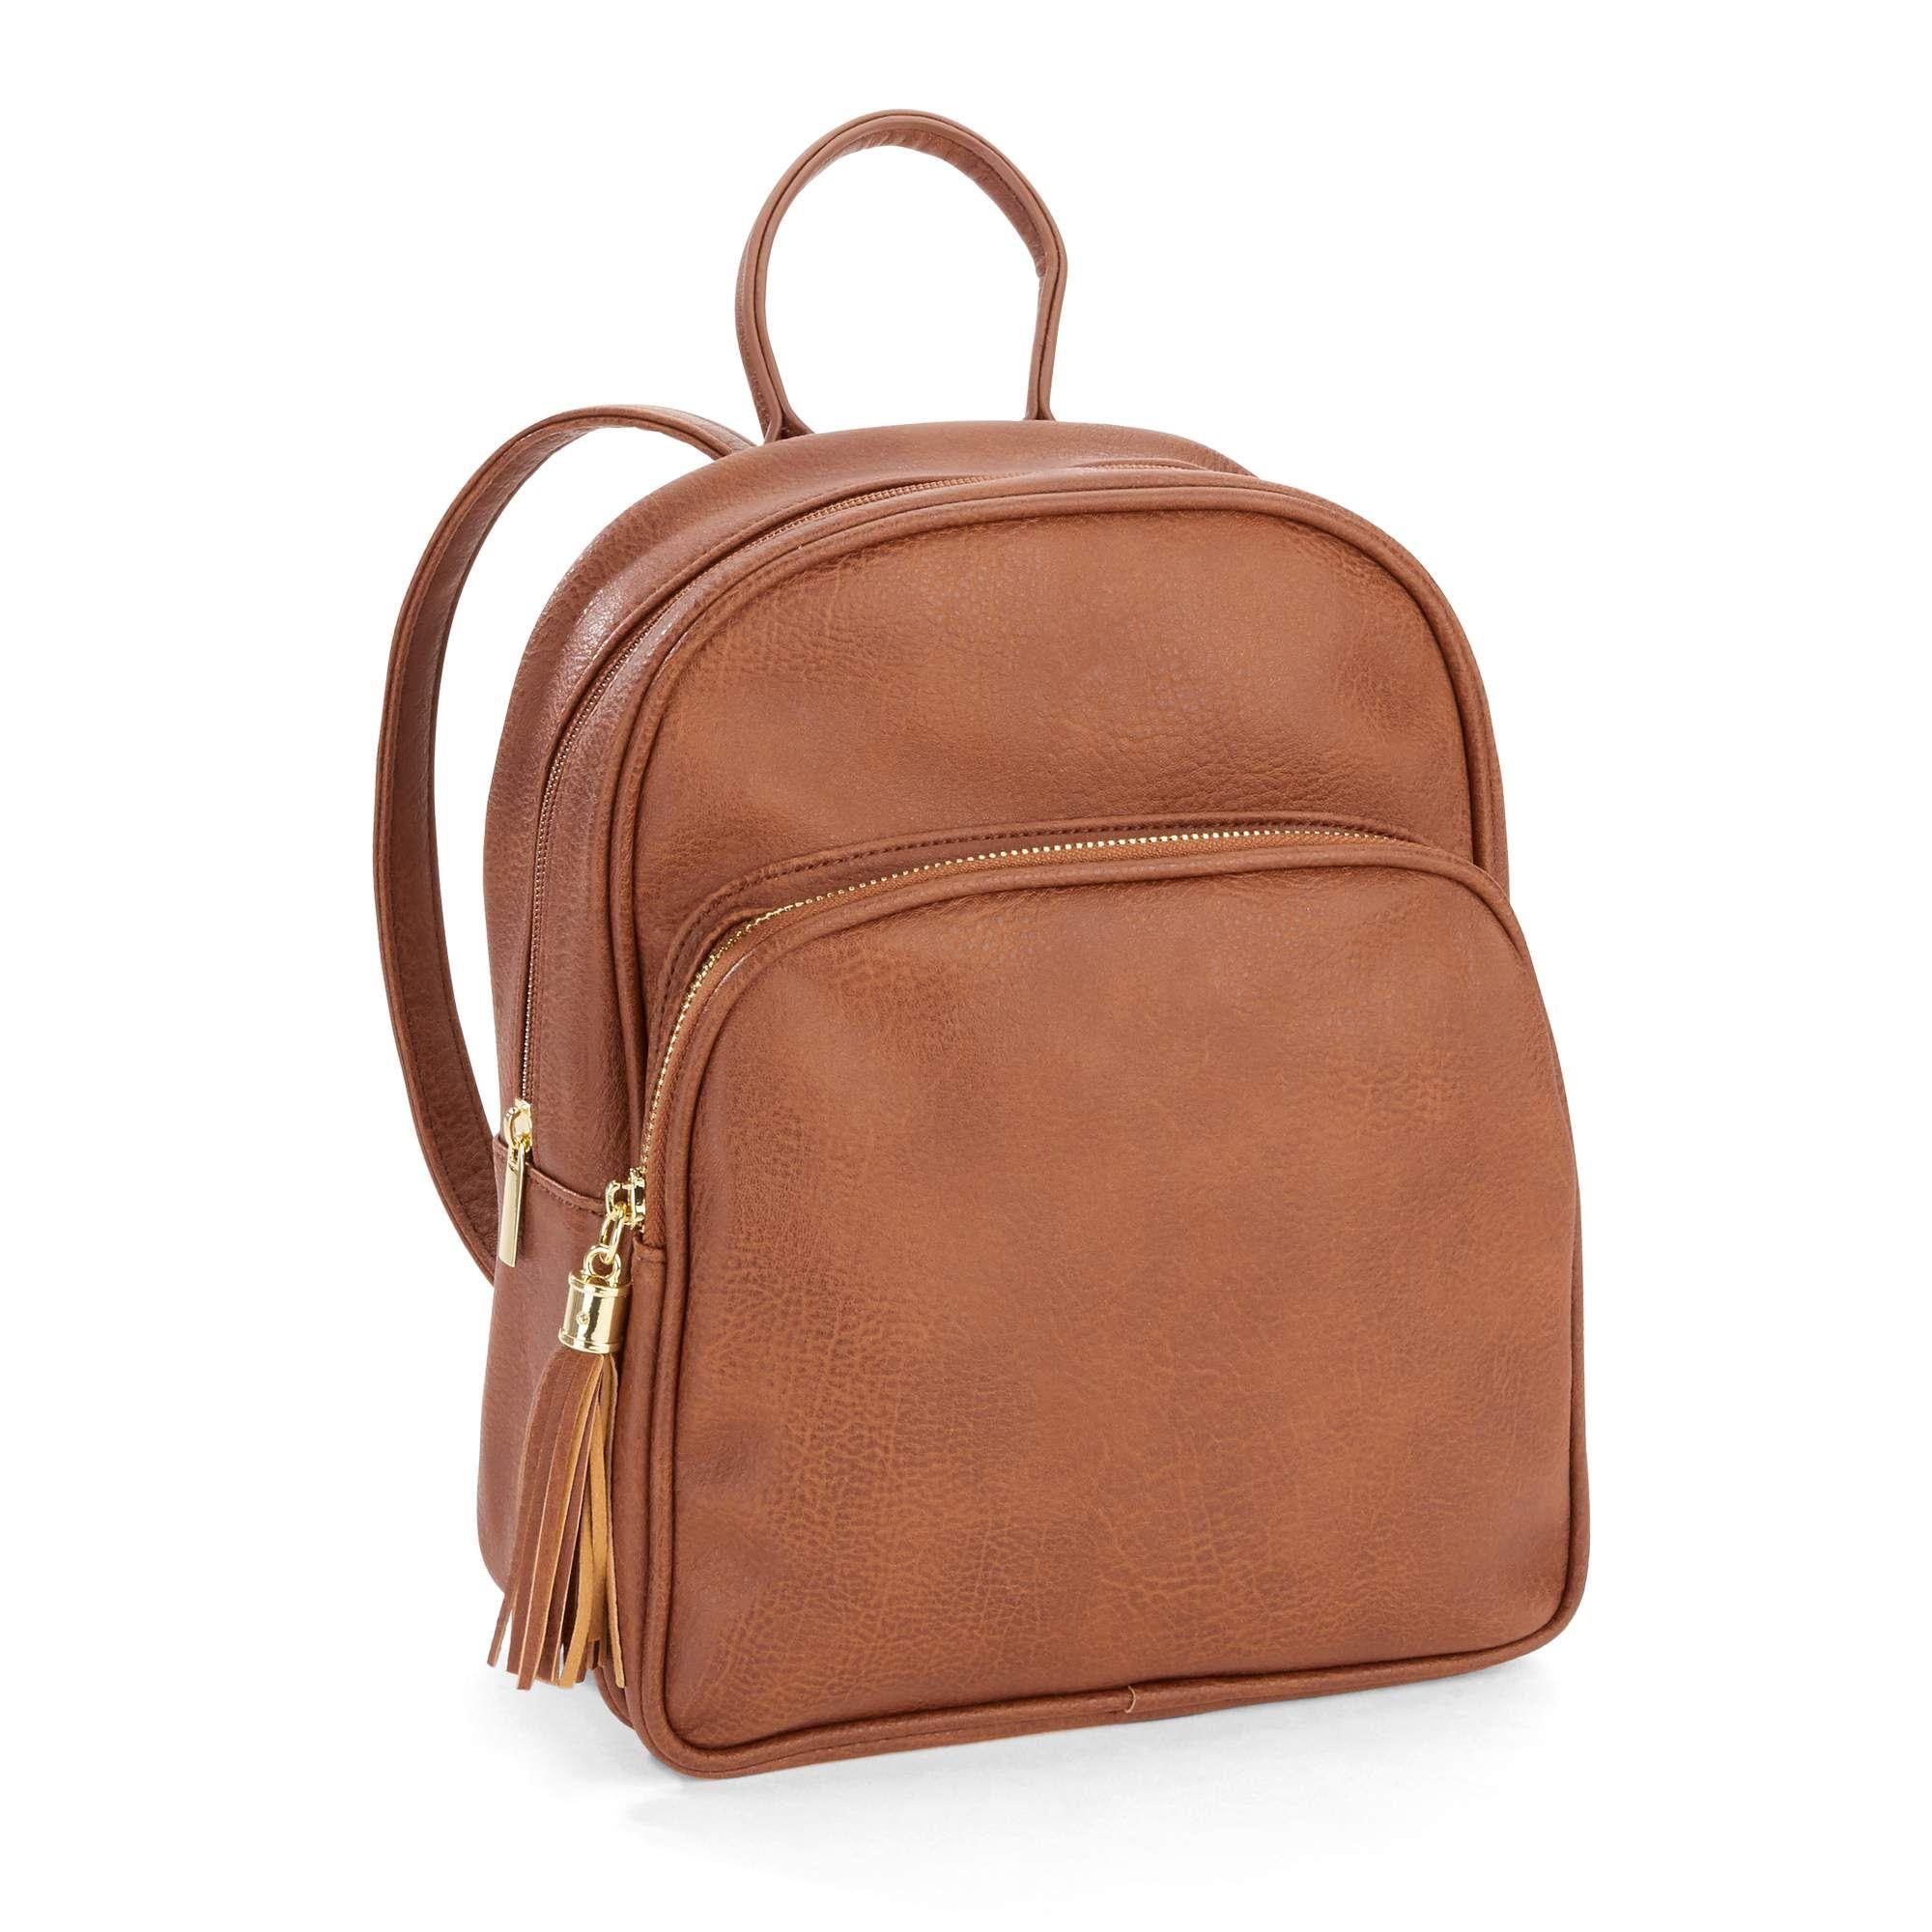 fdfa0a9a8e68 No Boundaries Women s Mini Backpack - Walmart.com